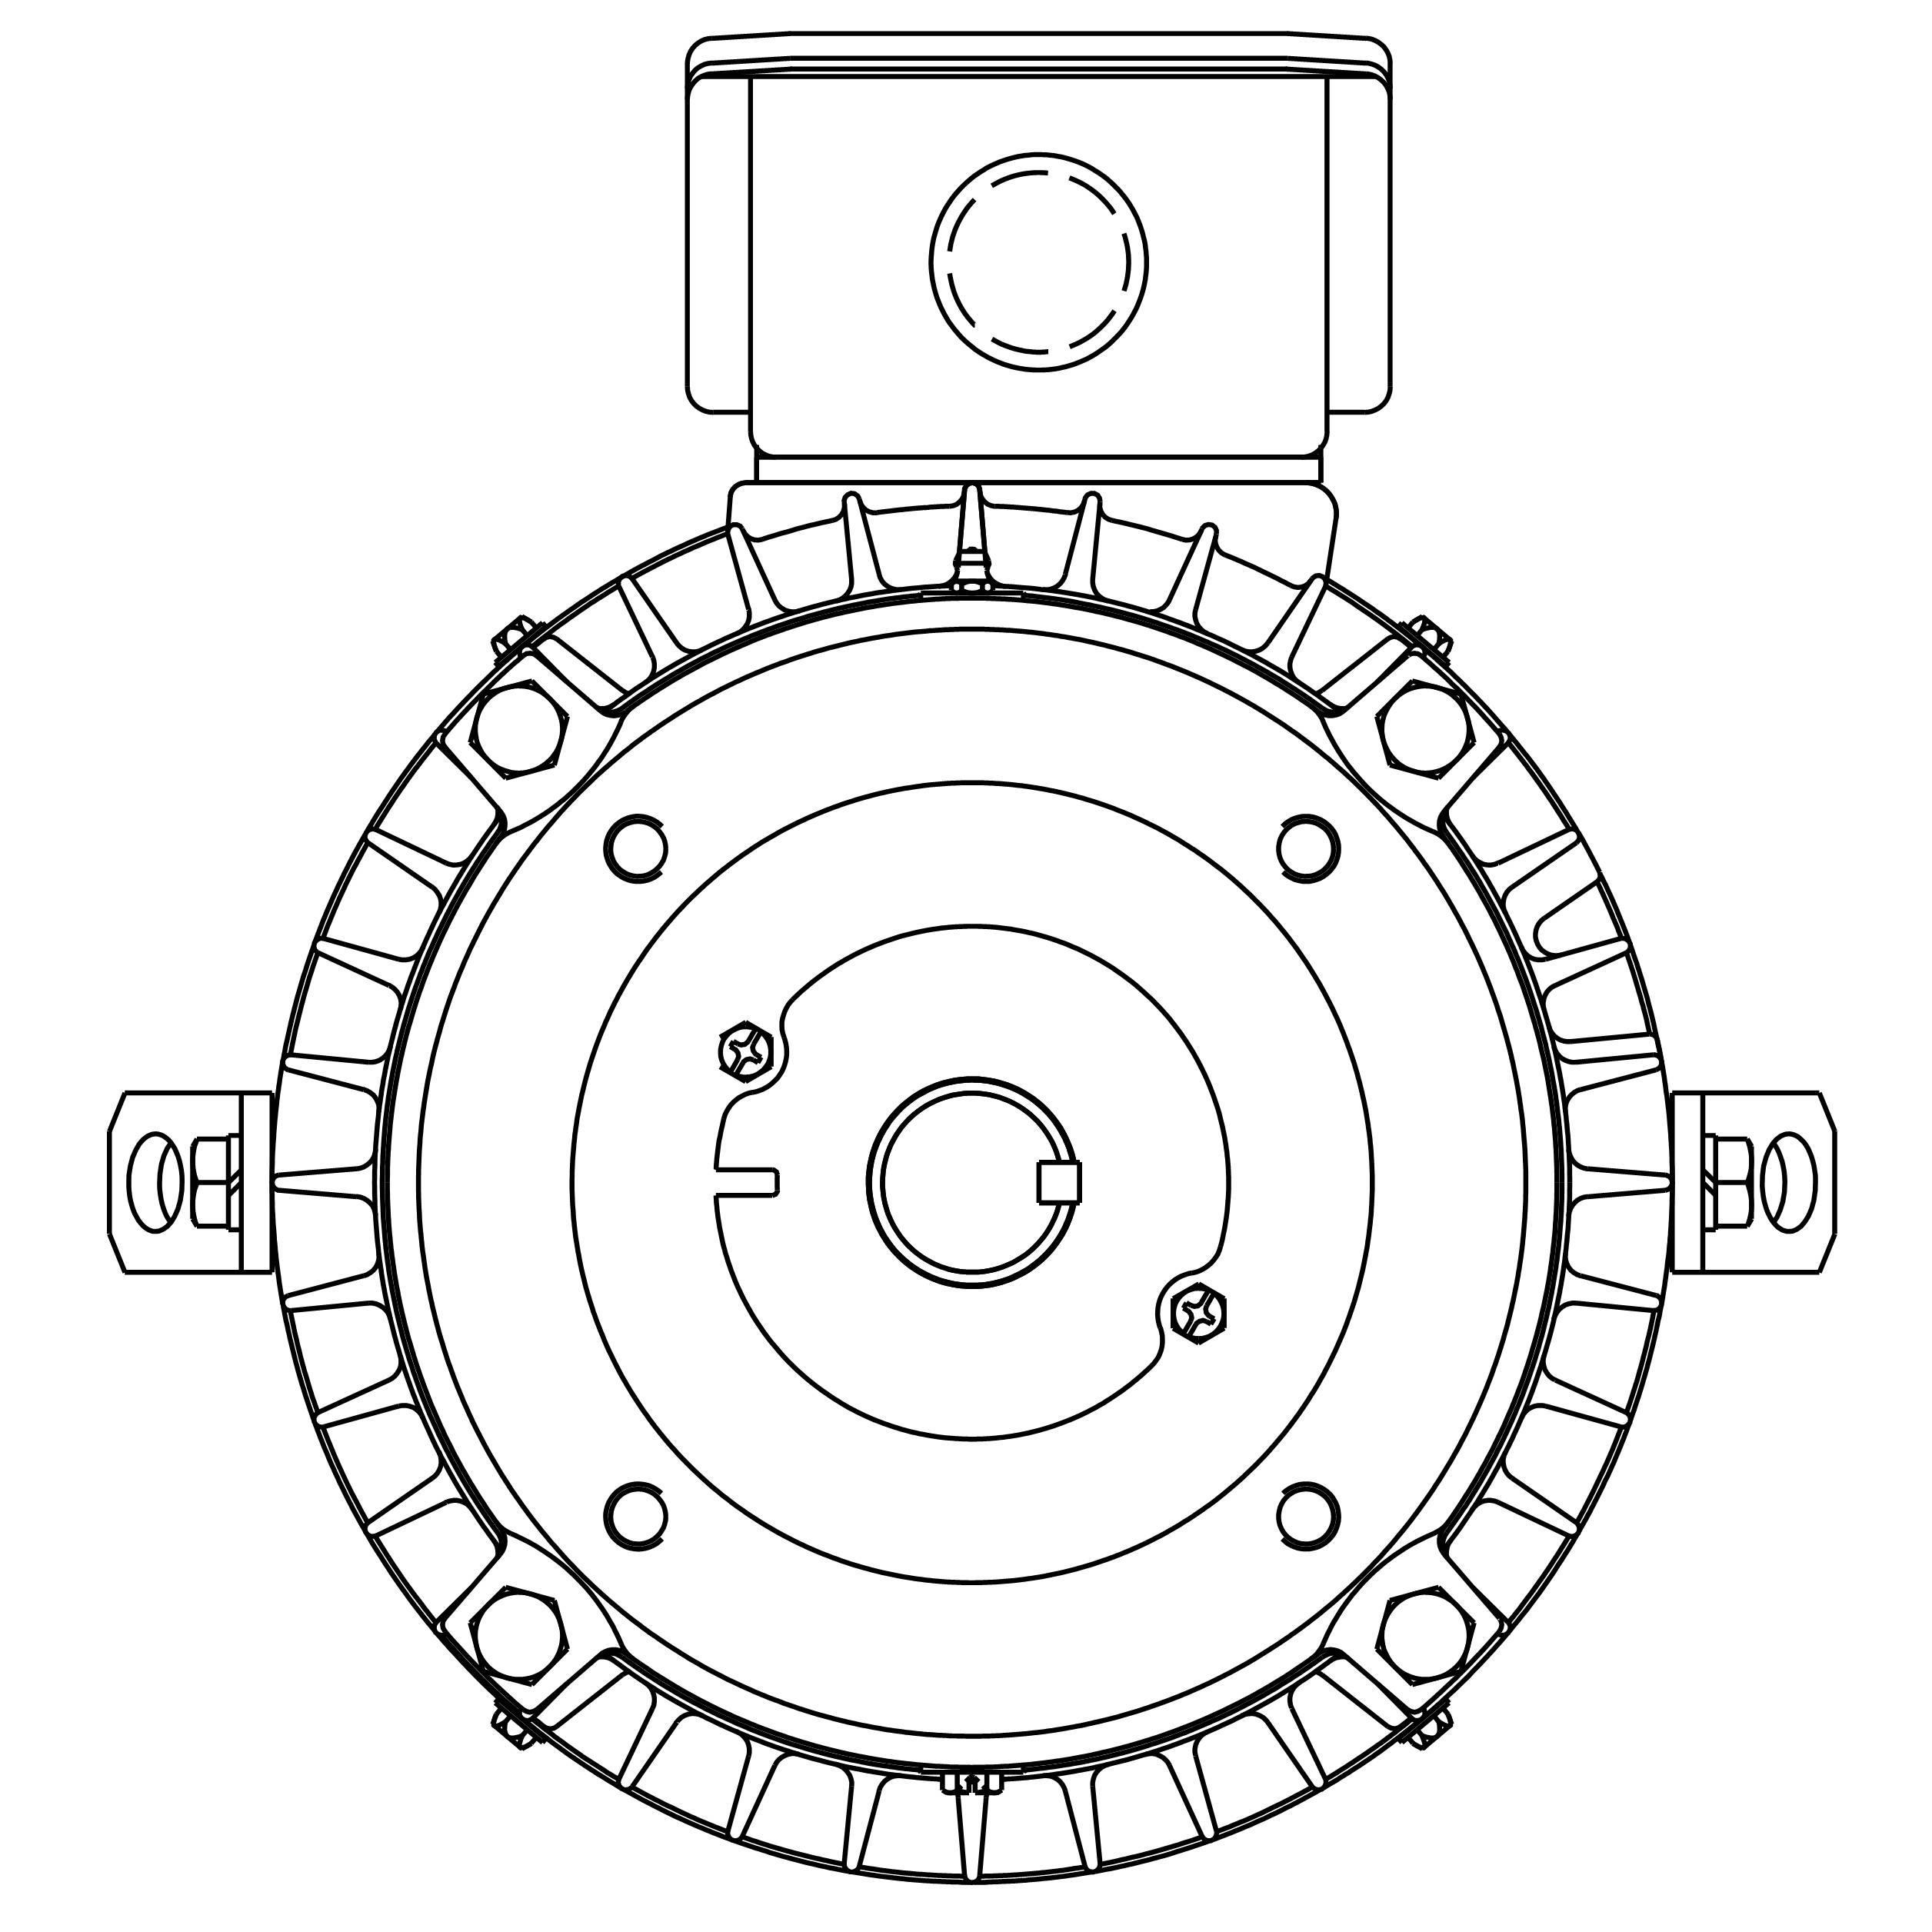 NPV0036C Teco-Westinghouse 3HP MAX-PE Cast Iron Electric